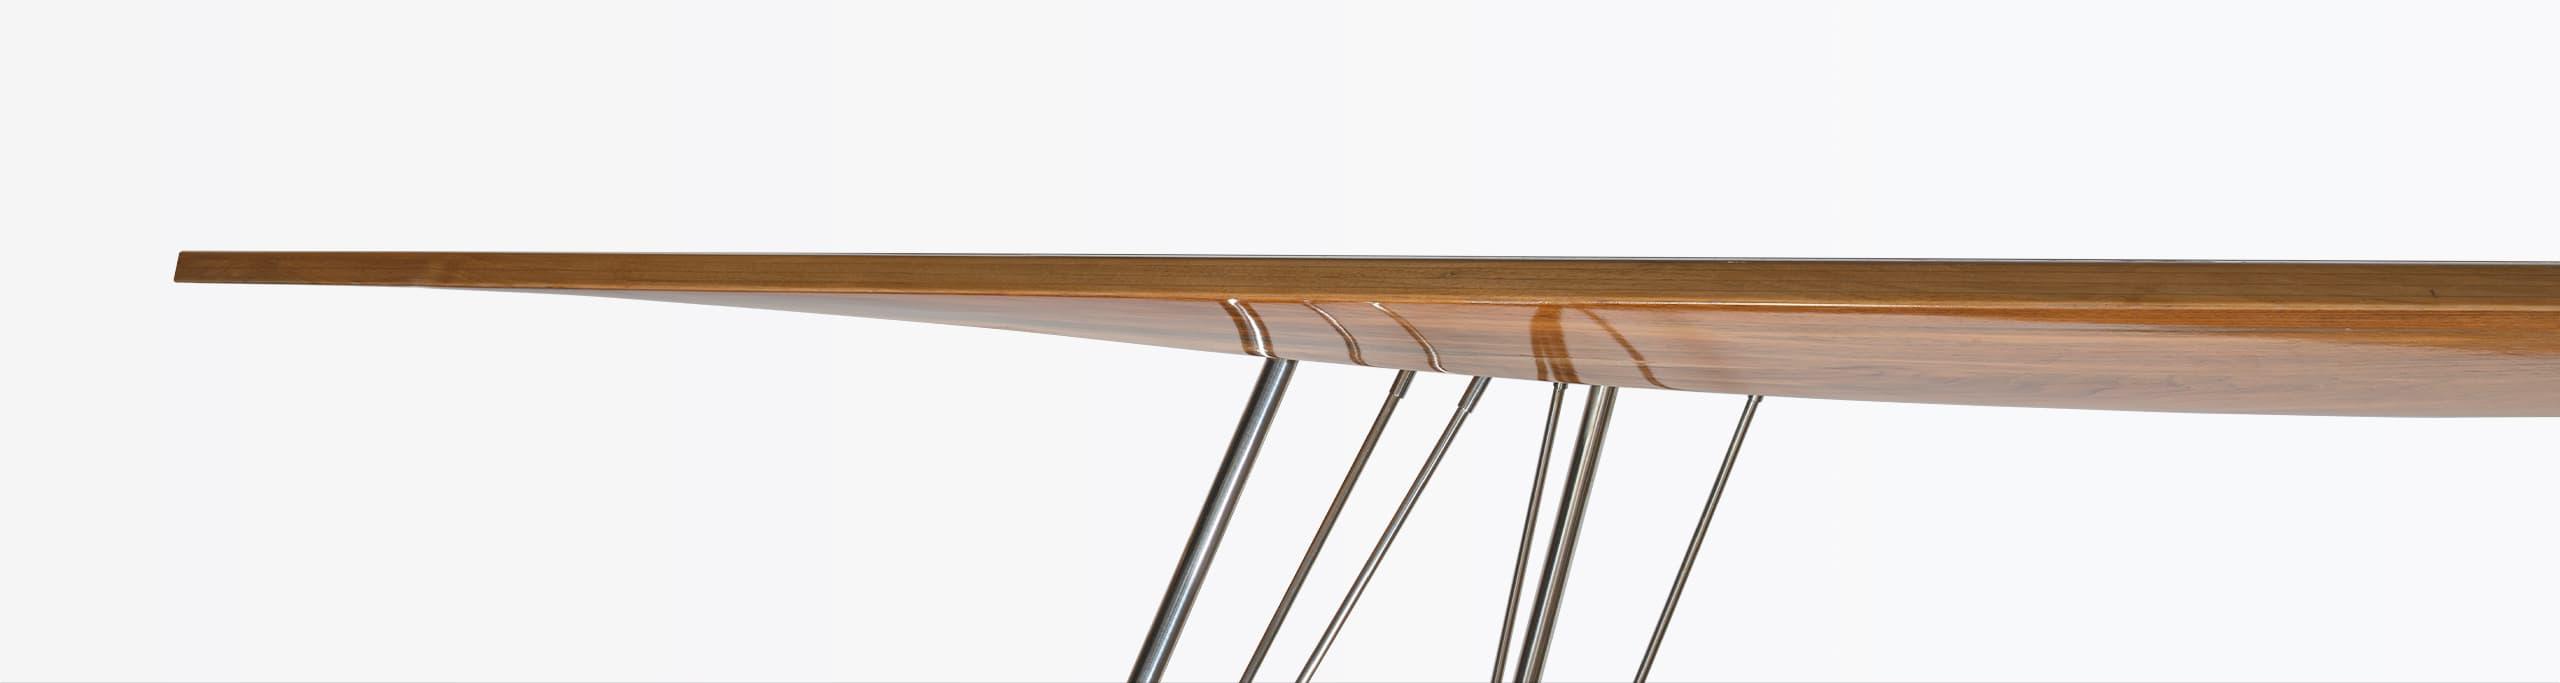 Hanno Groen Joanna Boothman Design Creative Direction Amsterdam Yacht Table inspired J-Class yachts